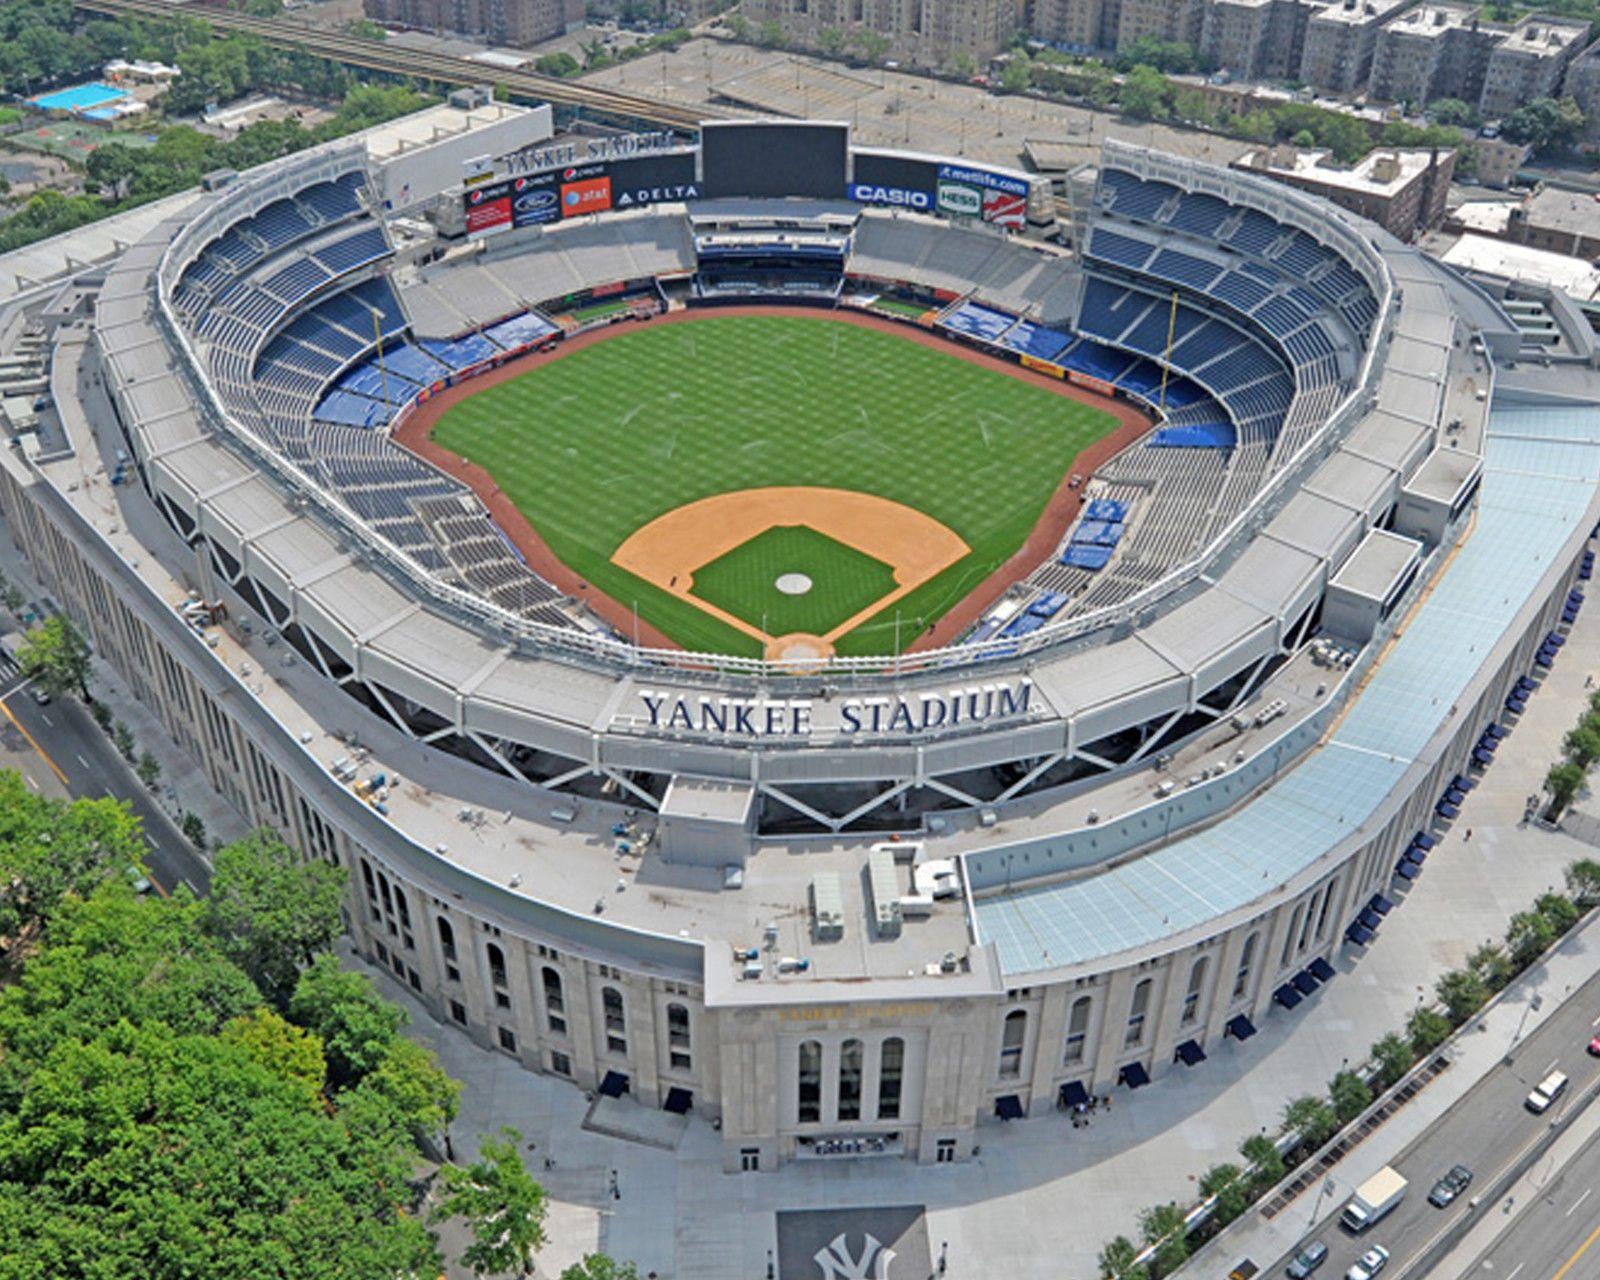 Madison Square Garden: Details About Yankee Stadium, New York City 8x10 High